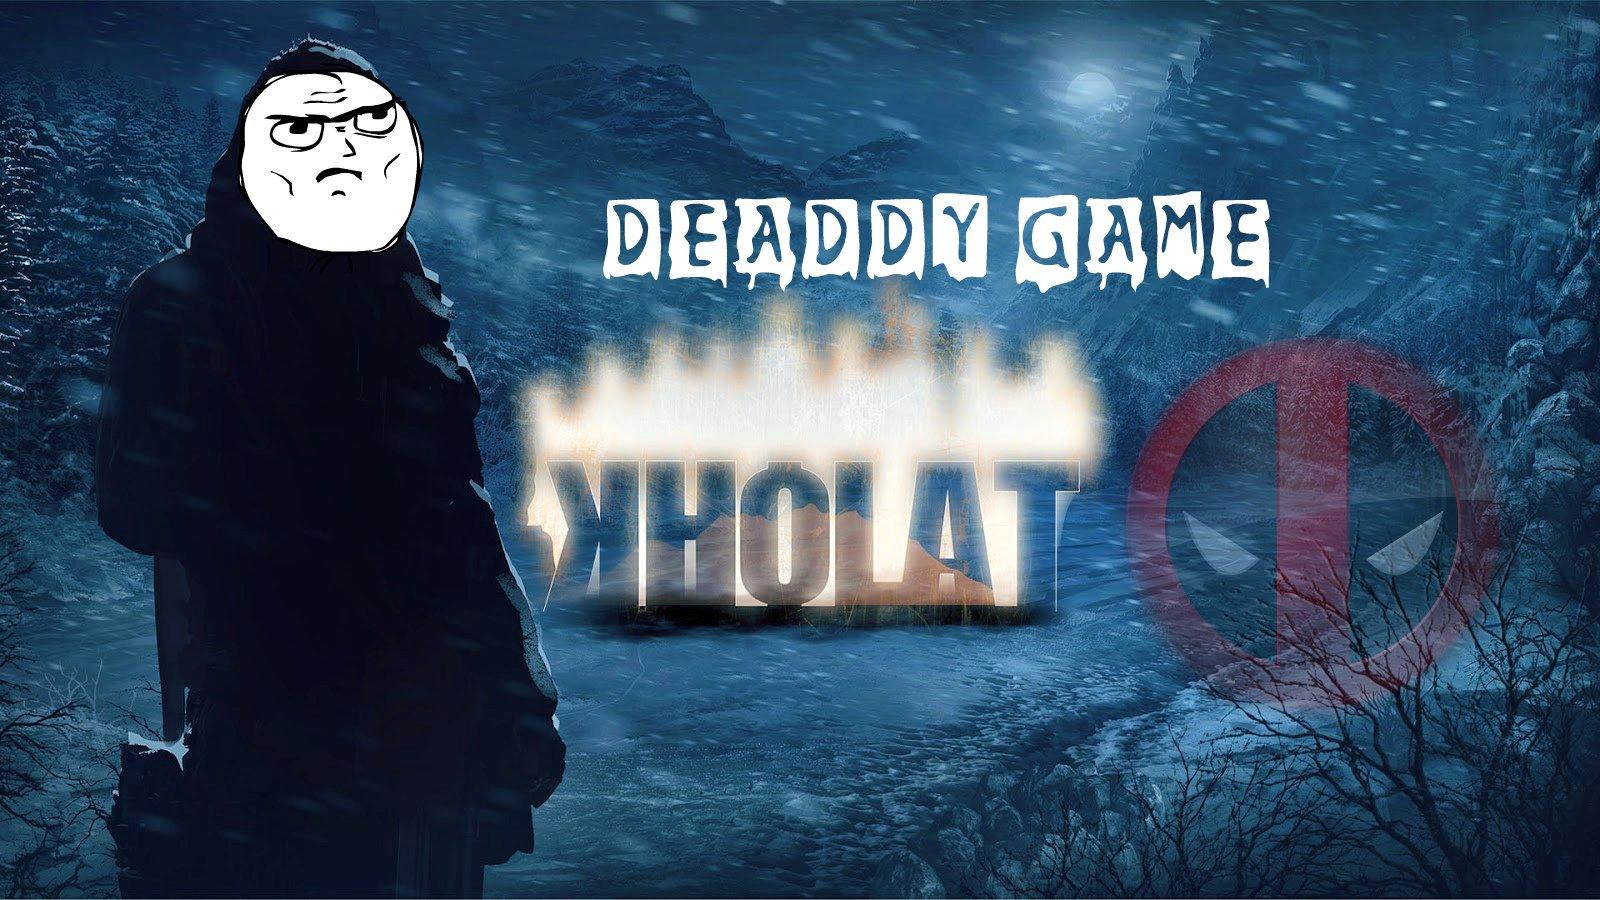 DEADDY GAME - Kholat (2015)  - Изображение 1